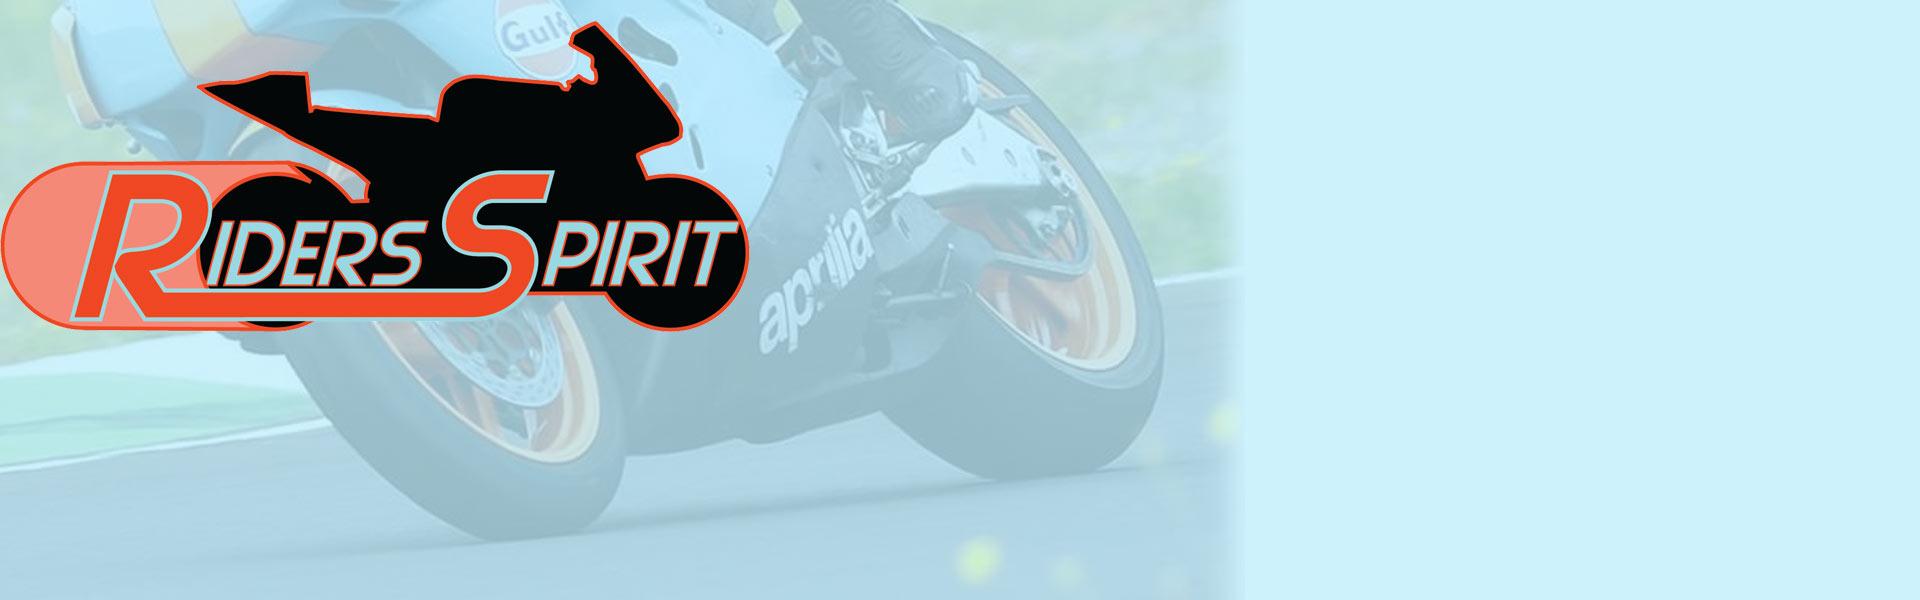 Riders Spirit